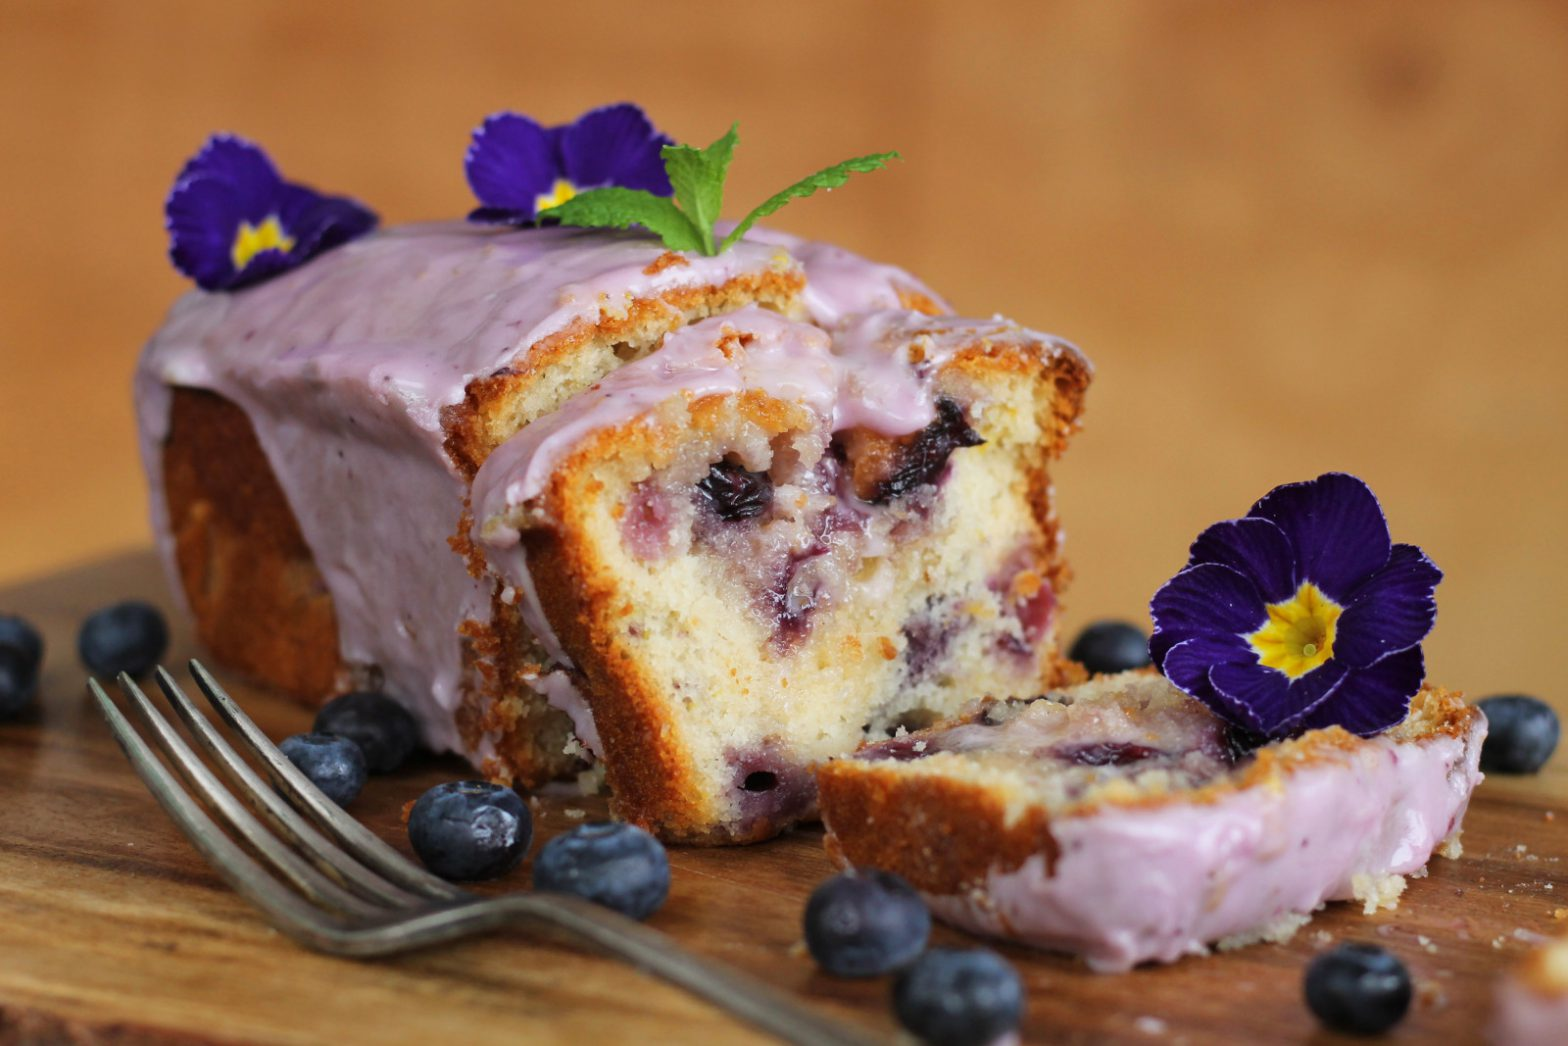 Vegan Blueberry Lemon Drizzle Cake